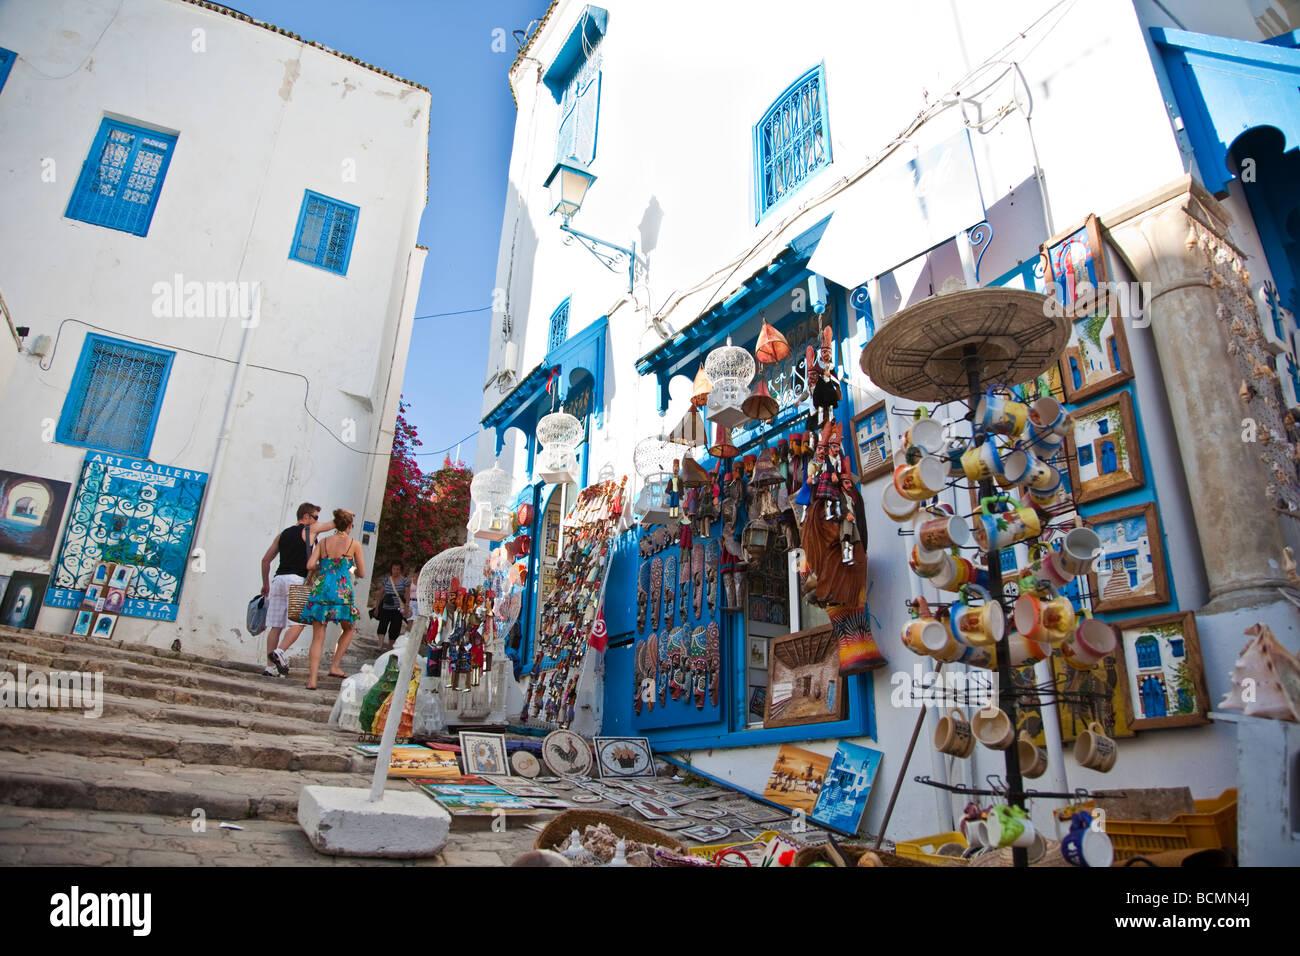 Shop Tunisia Stock Photos Amp Shop Tunisia Stock Images Alamy